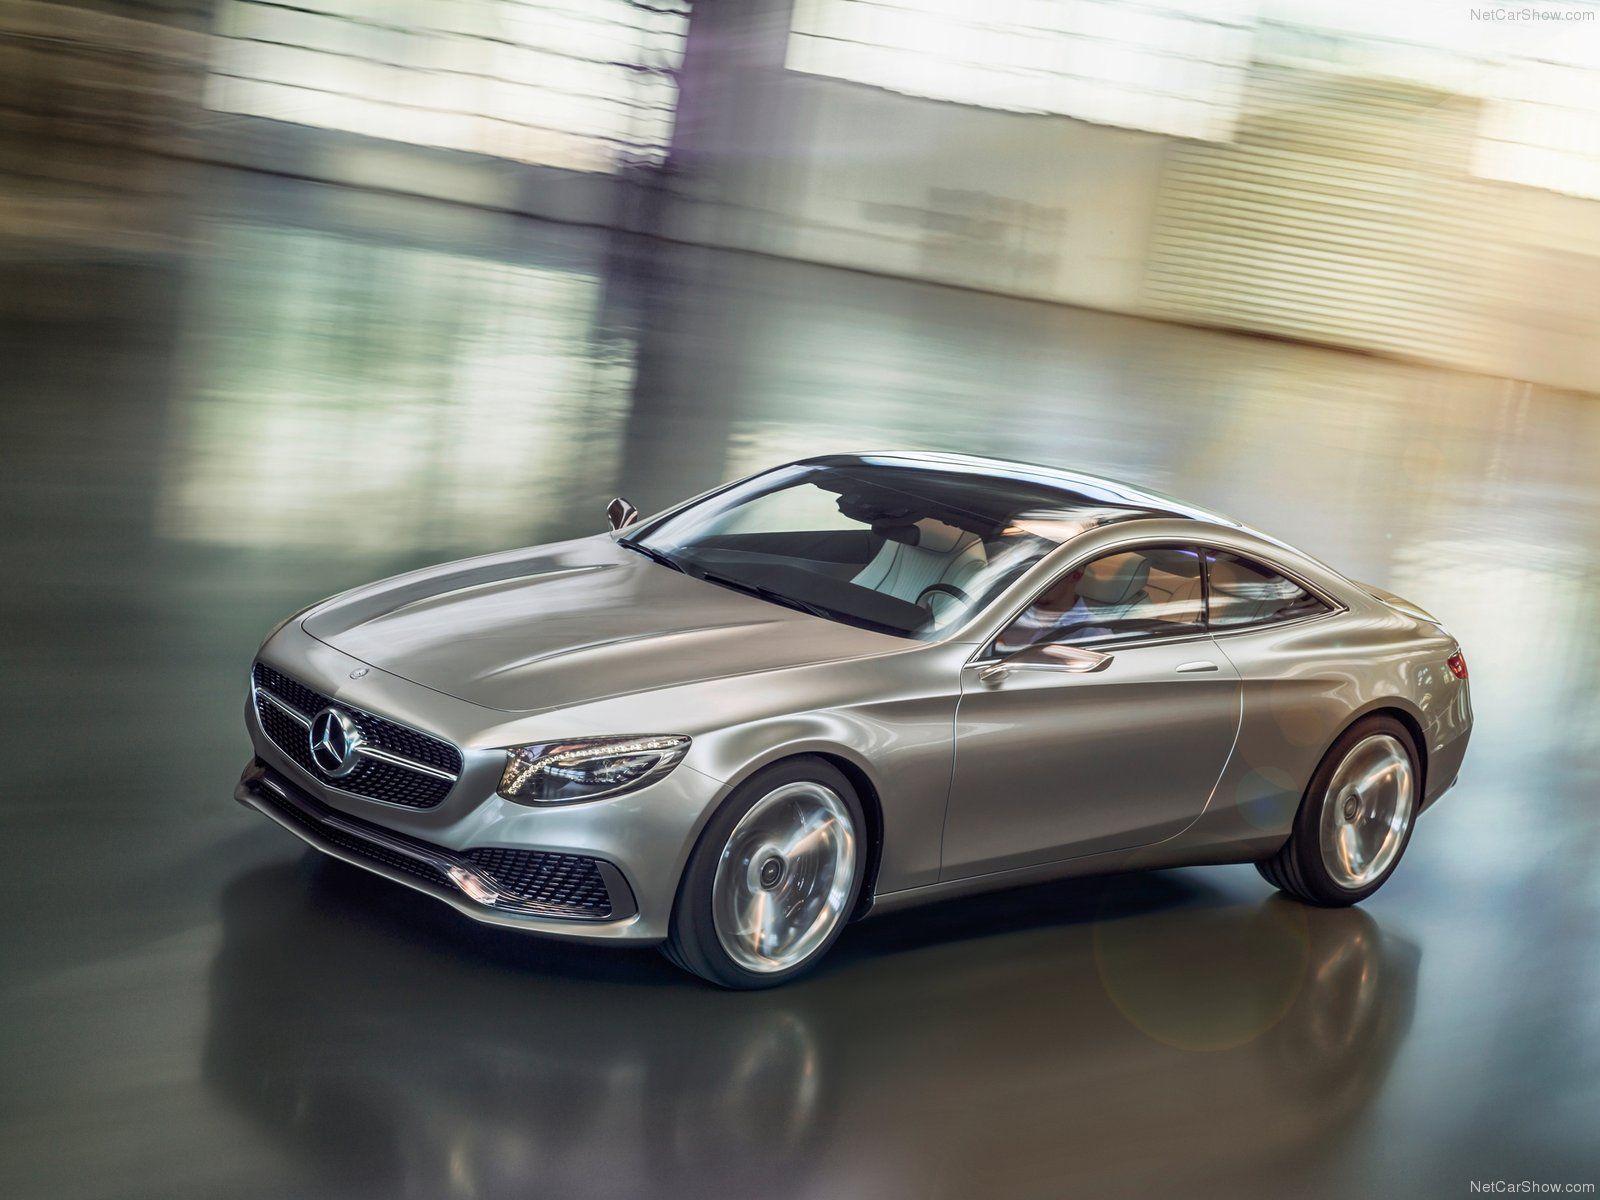 Mercedes-Benz S-Class Coupe Concept (2013)